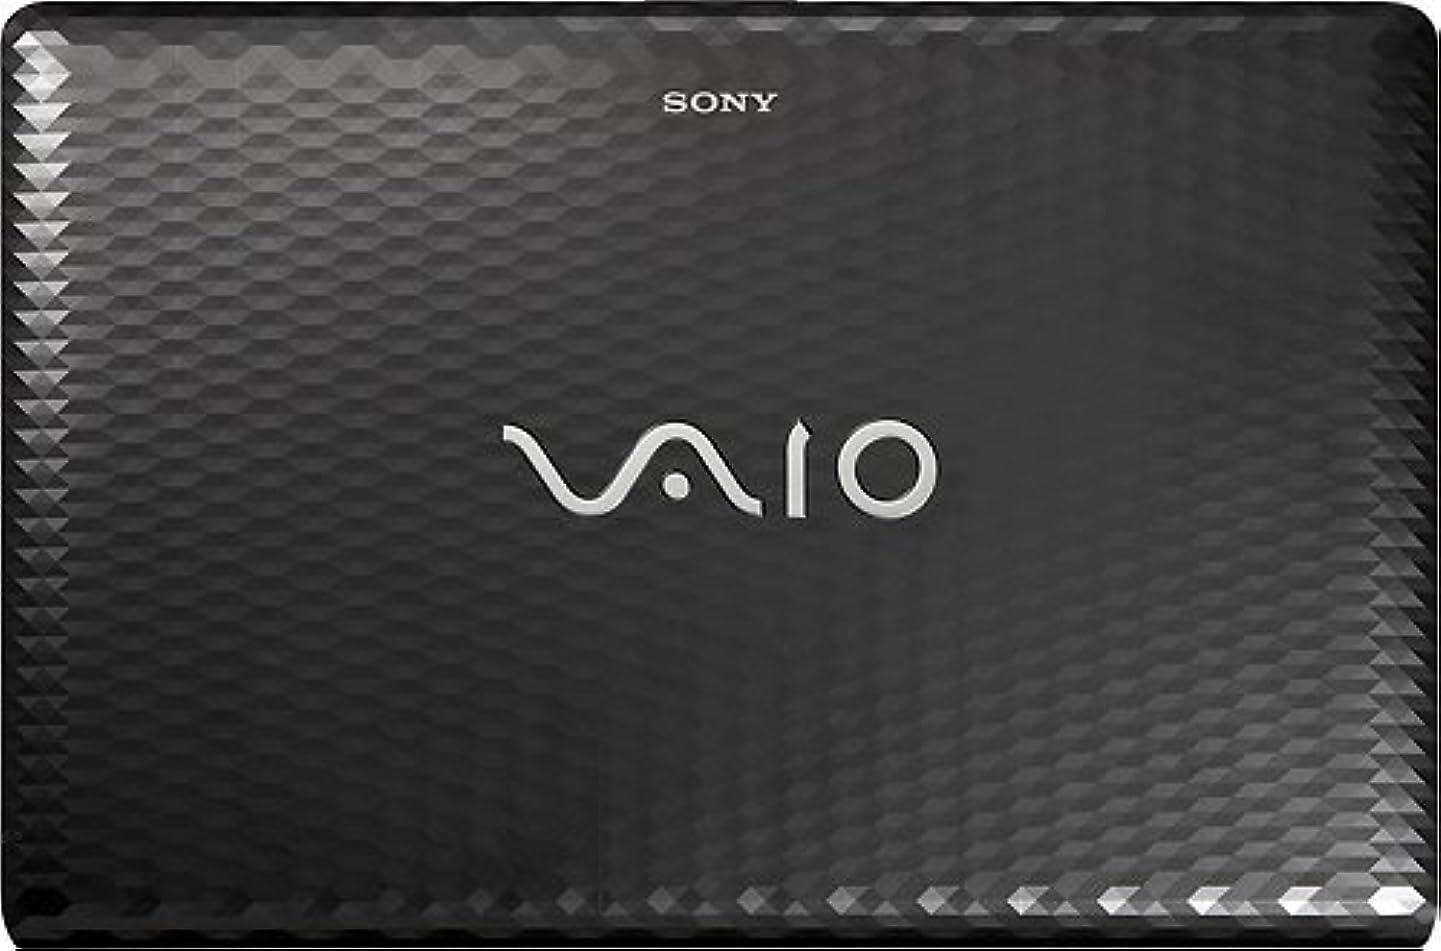 Sony - VAIO VPCEH25FM/B Laptop PC - Intel i3-2330M 2.2GHz, 15.5